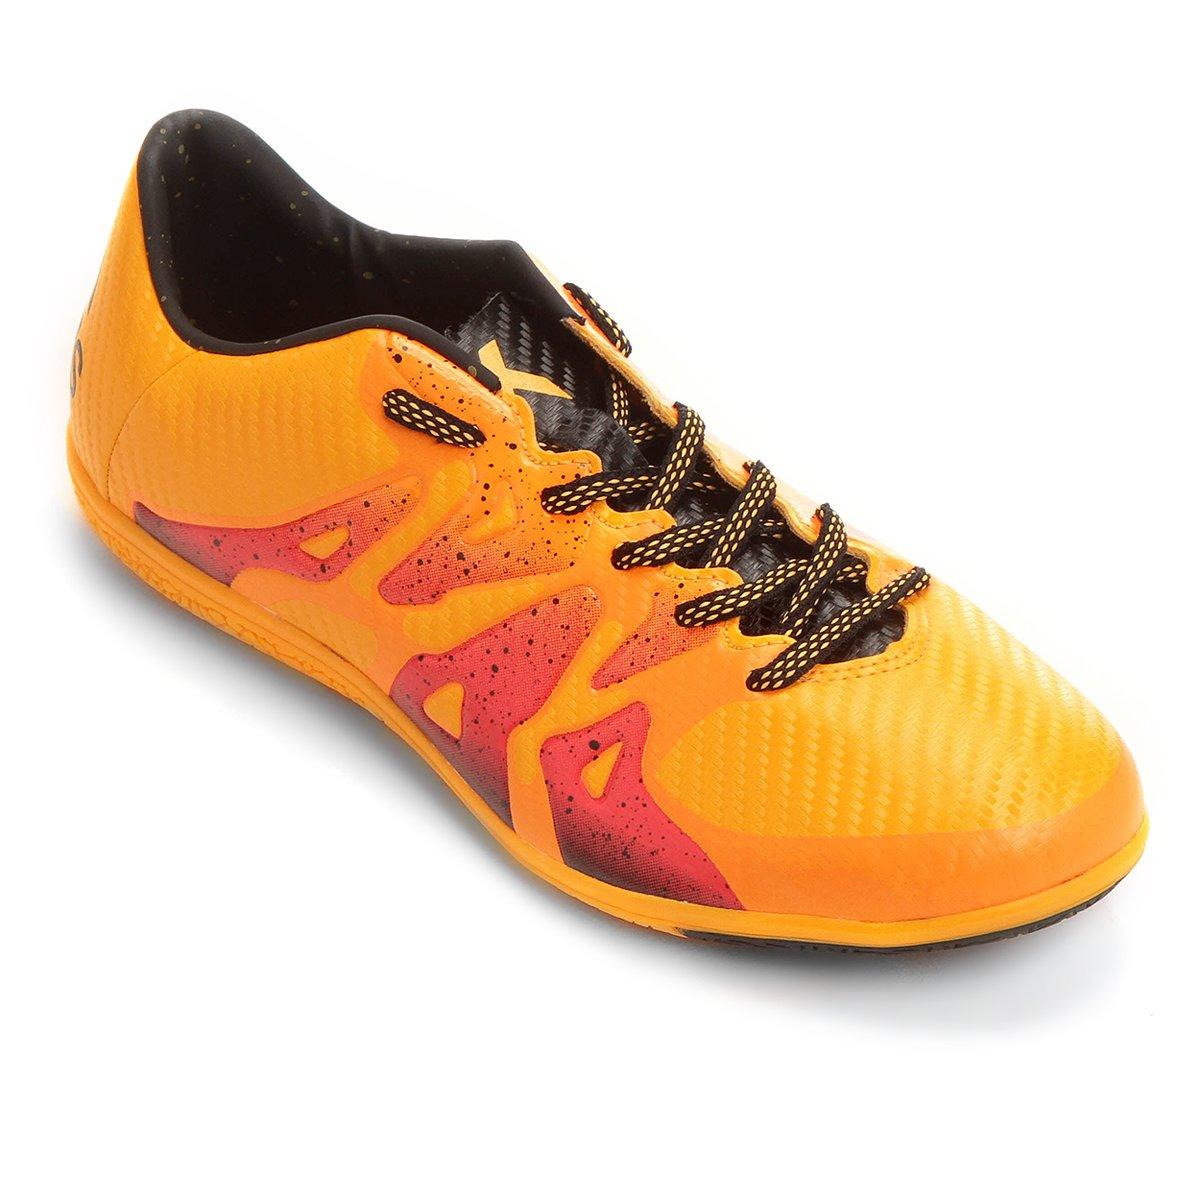 a54dbe2097a6d Chuteira Futsal Adidas X 15 3 IN Masculina - Amarelo e Rosa - Compre Agora